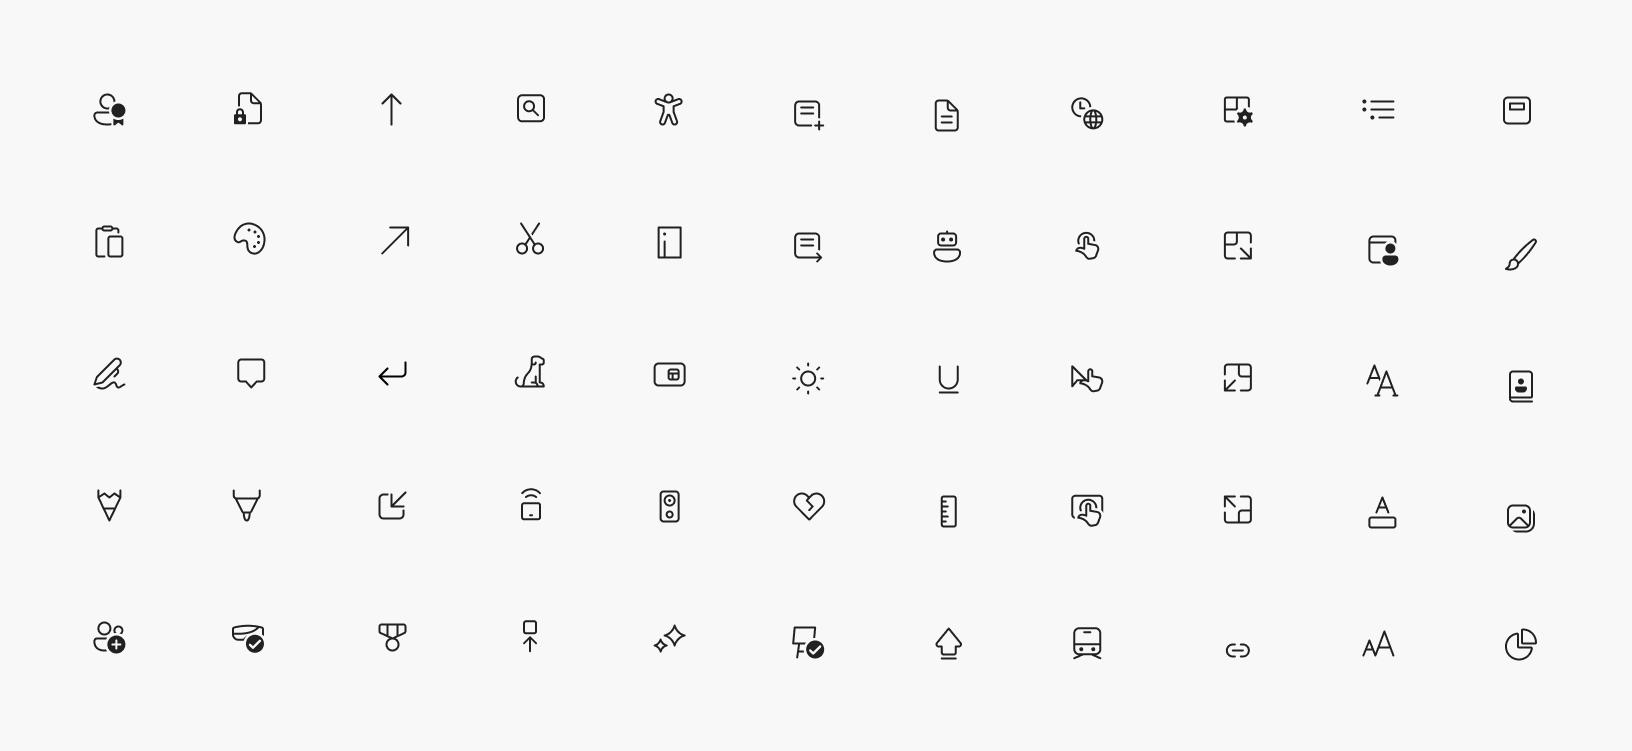 Windows 10 Icons